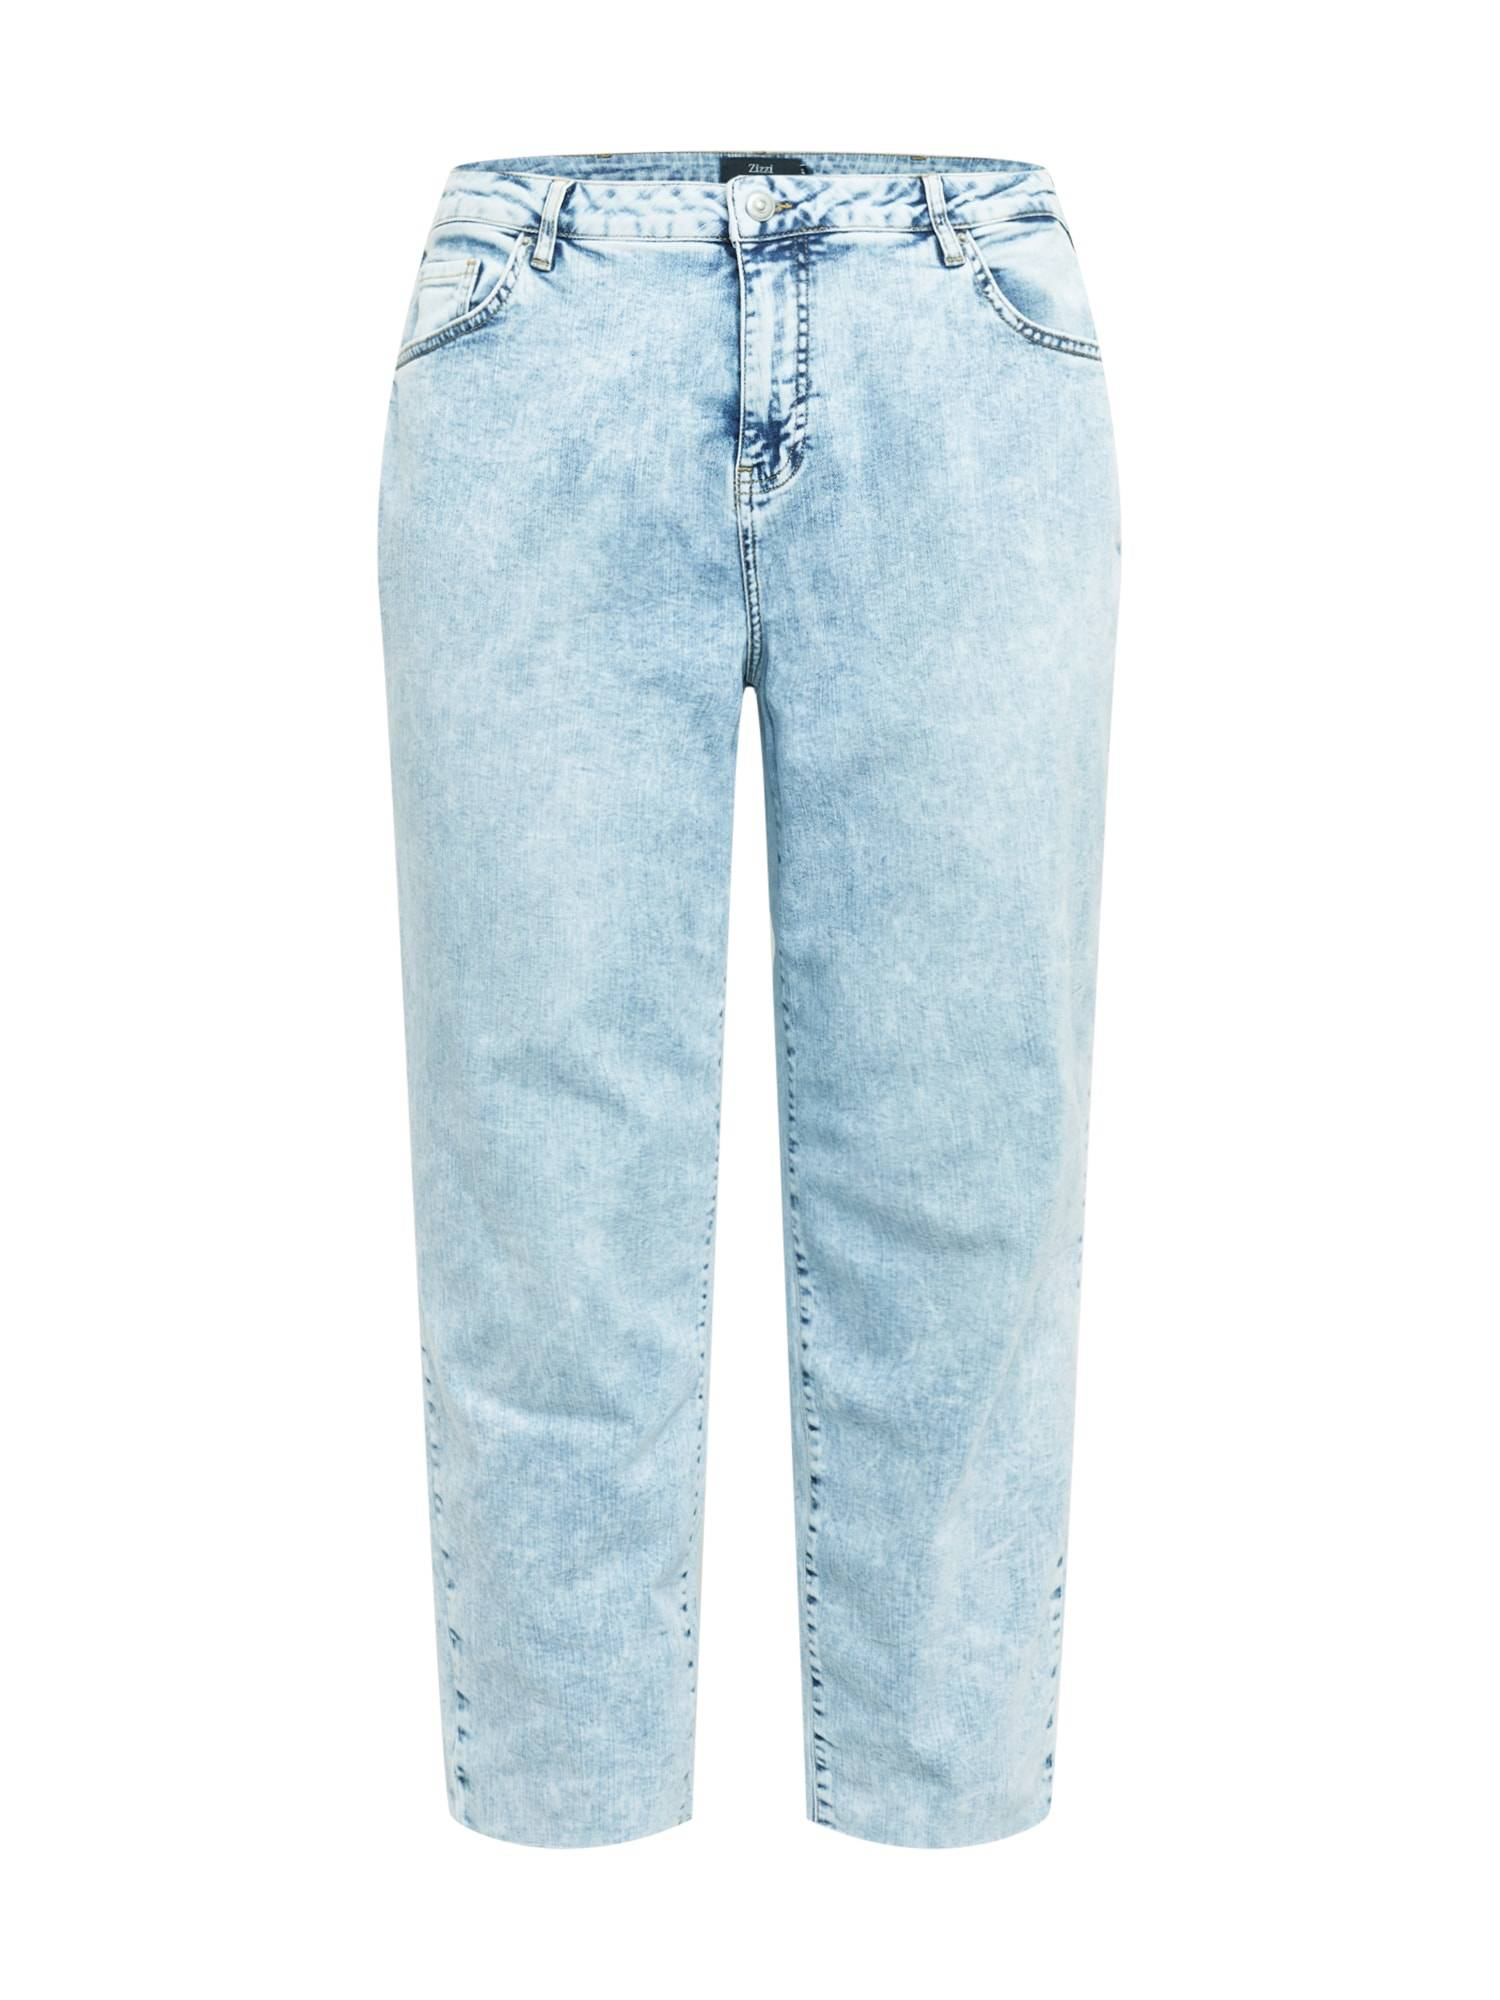 Zizzi Jean 'JAYDEN'  - Bleu - Taille: 46 - female